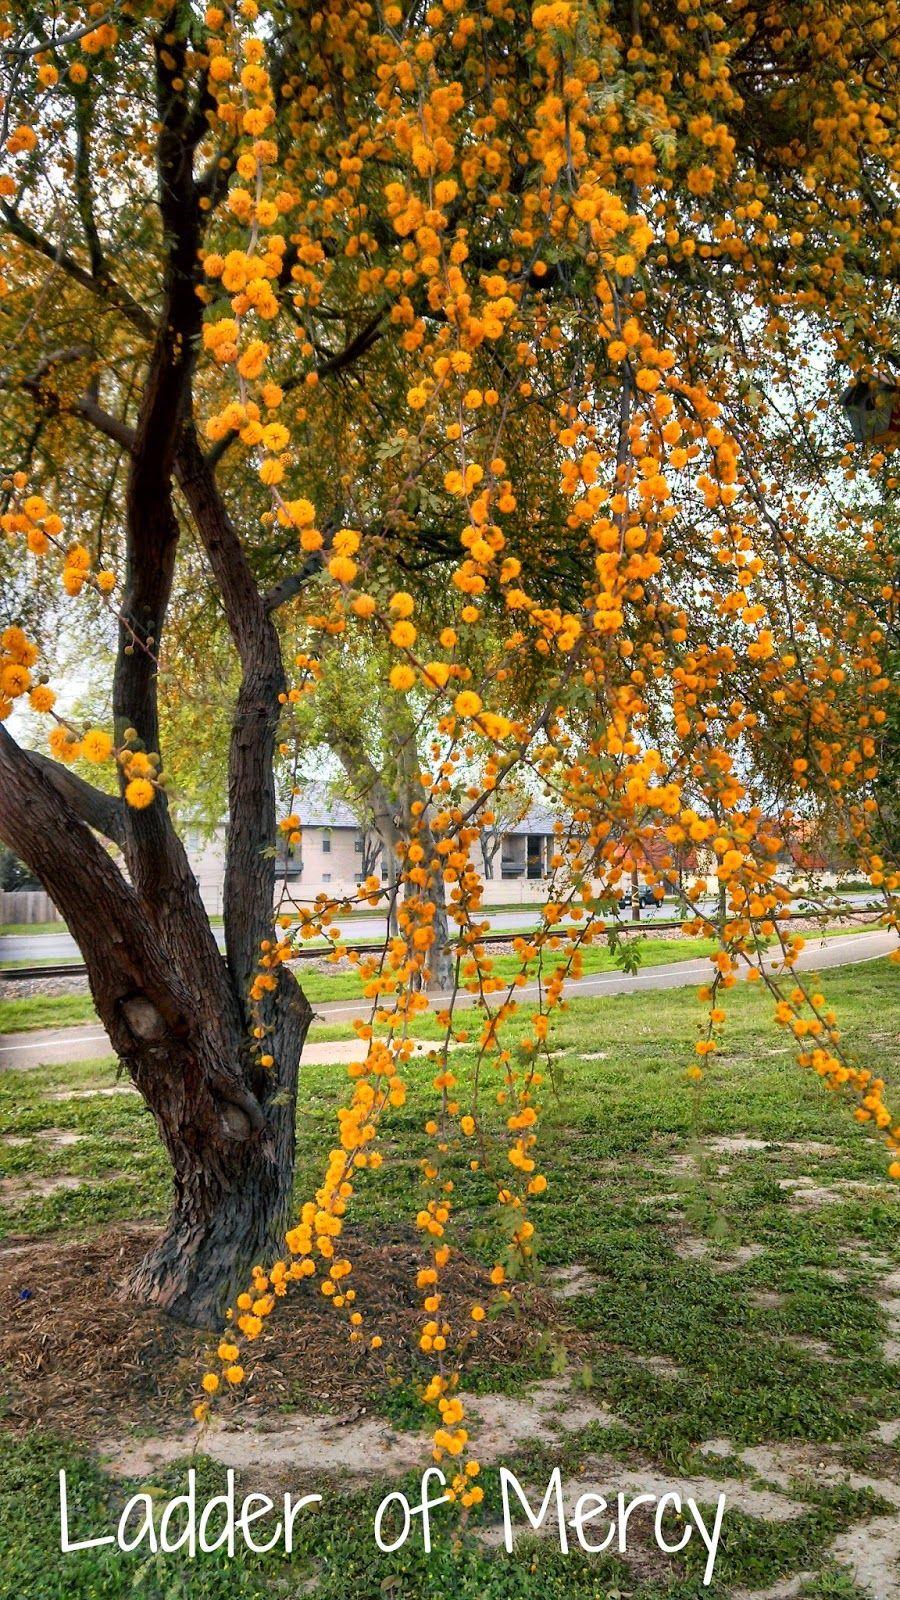 Ladder of Mercy: Huisache, Acacia farnesiana | Ladder of Mercy ...